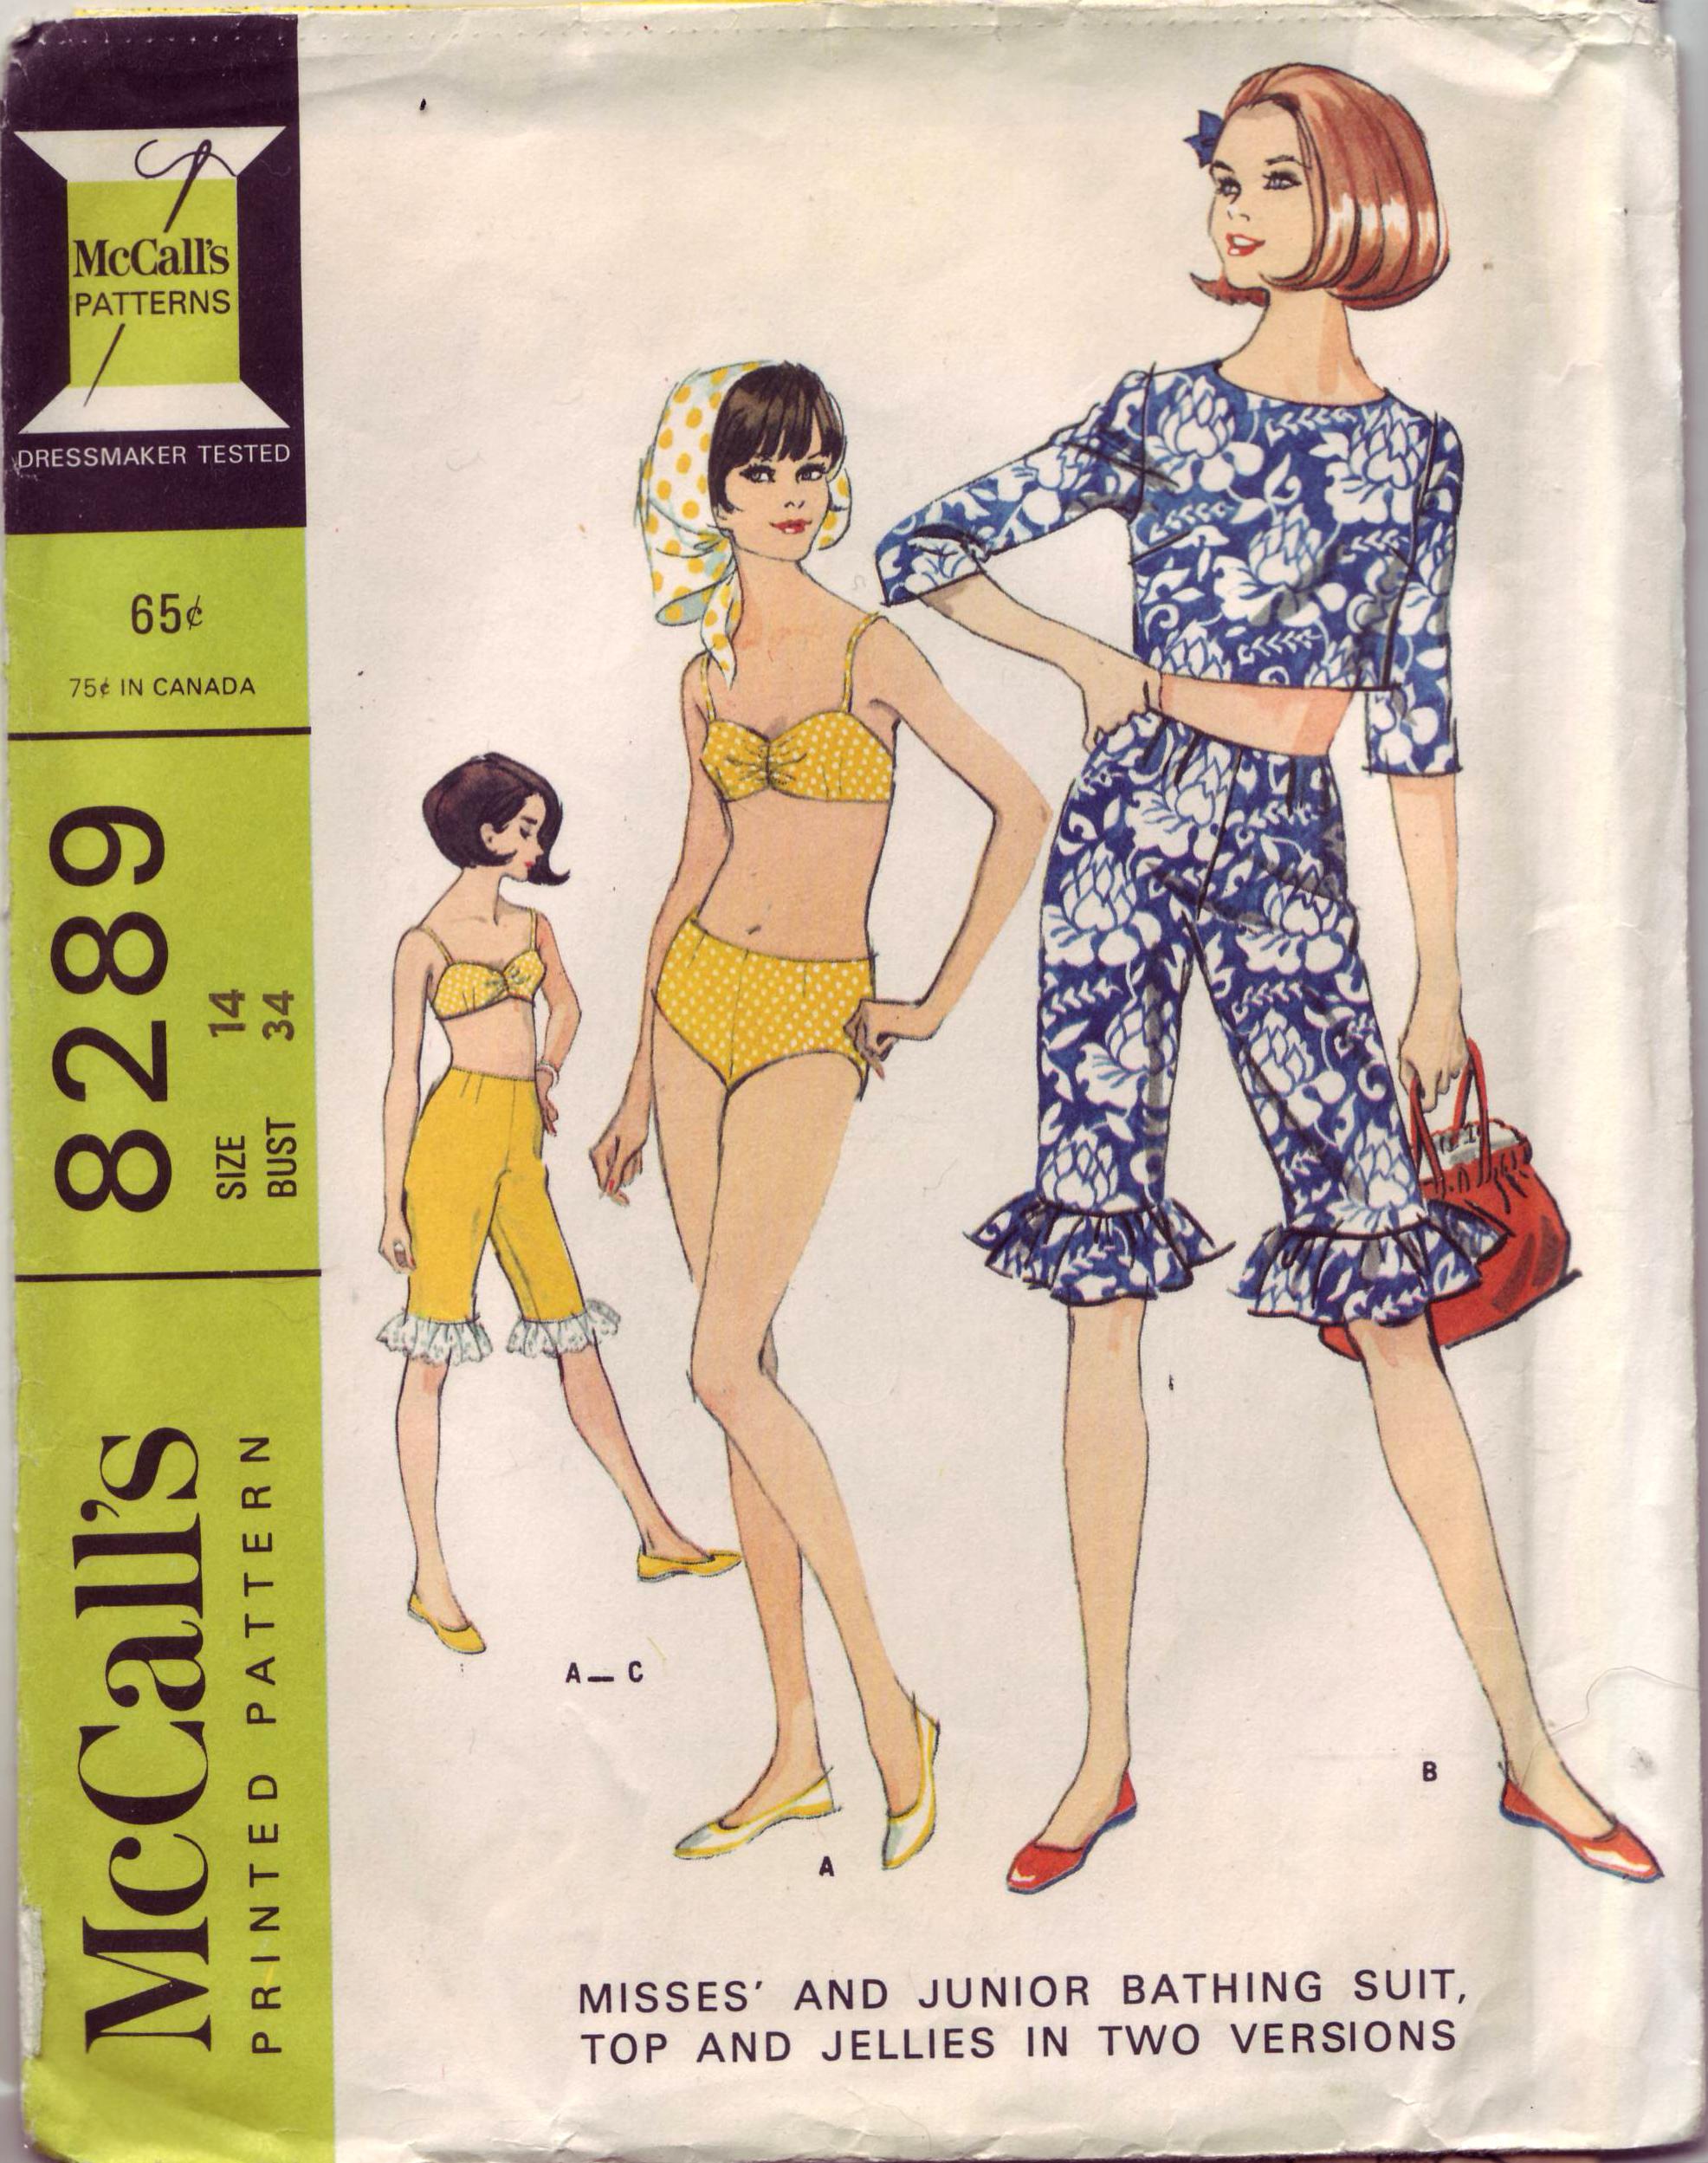 McCall's 8289